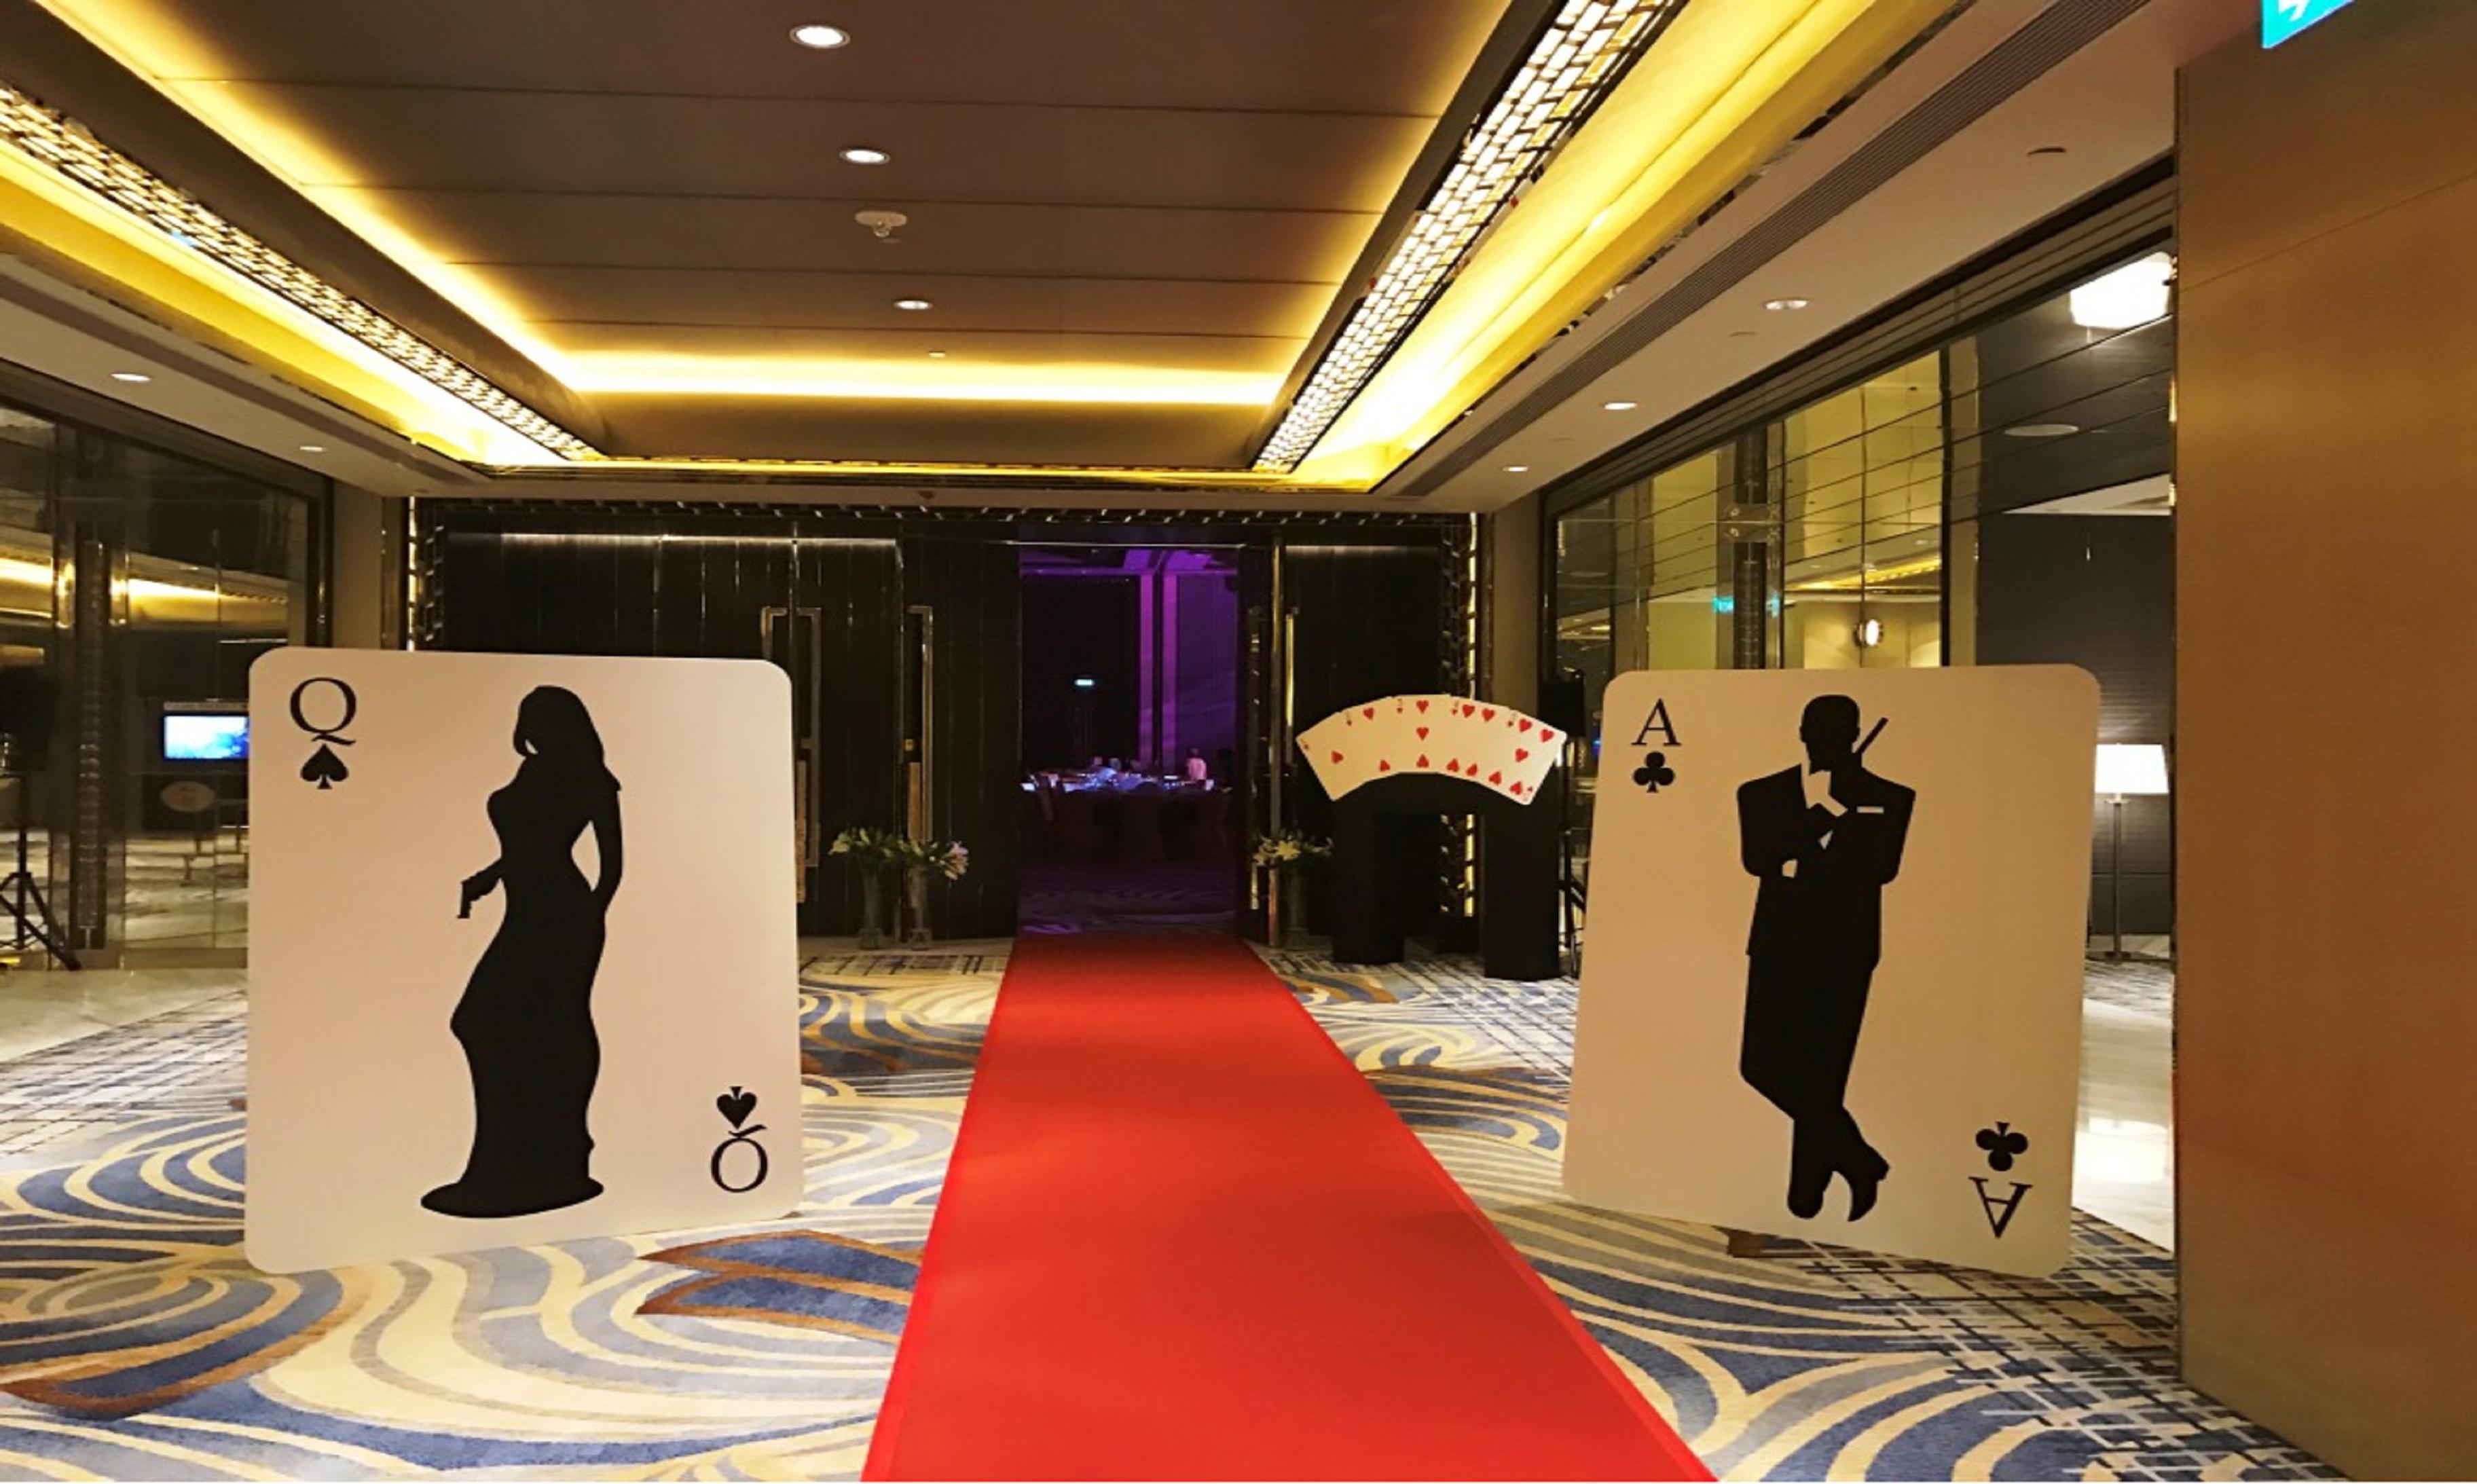 007 Casino Fever Party Planner Vietnam